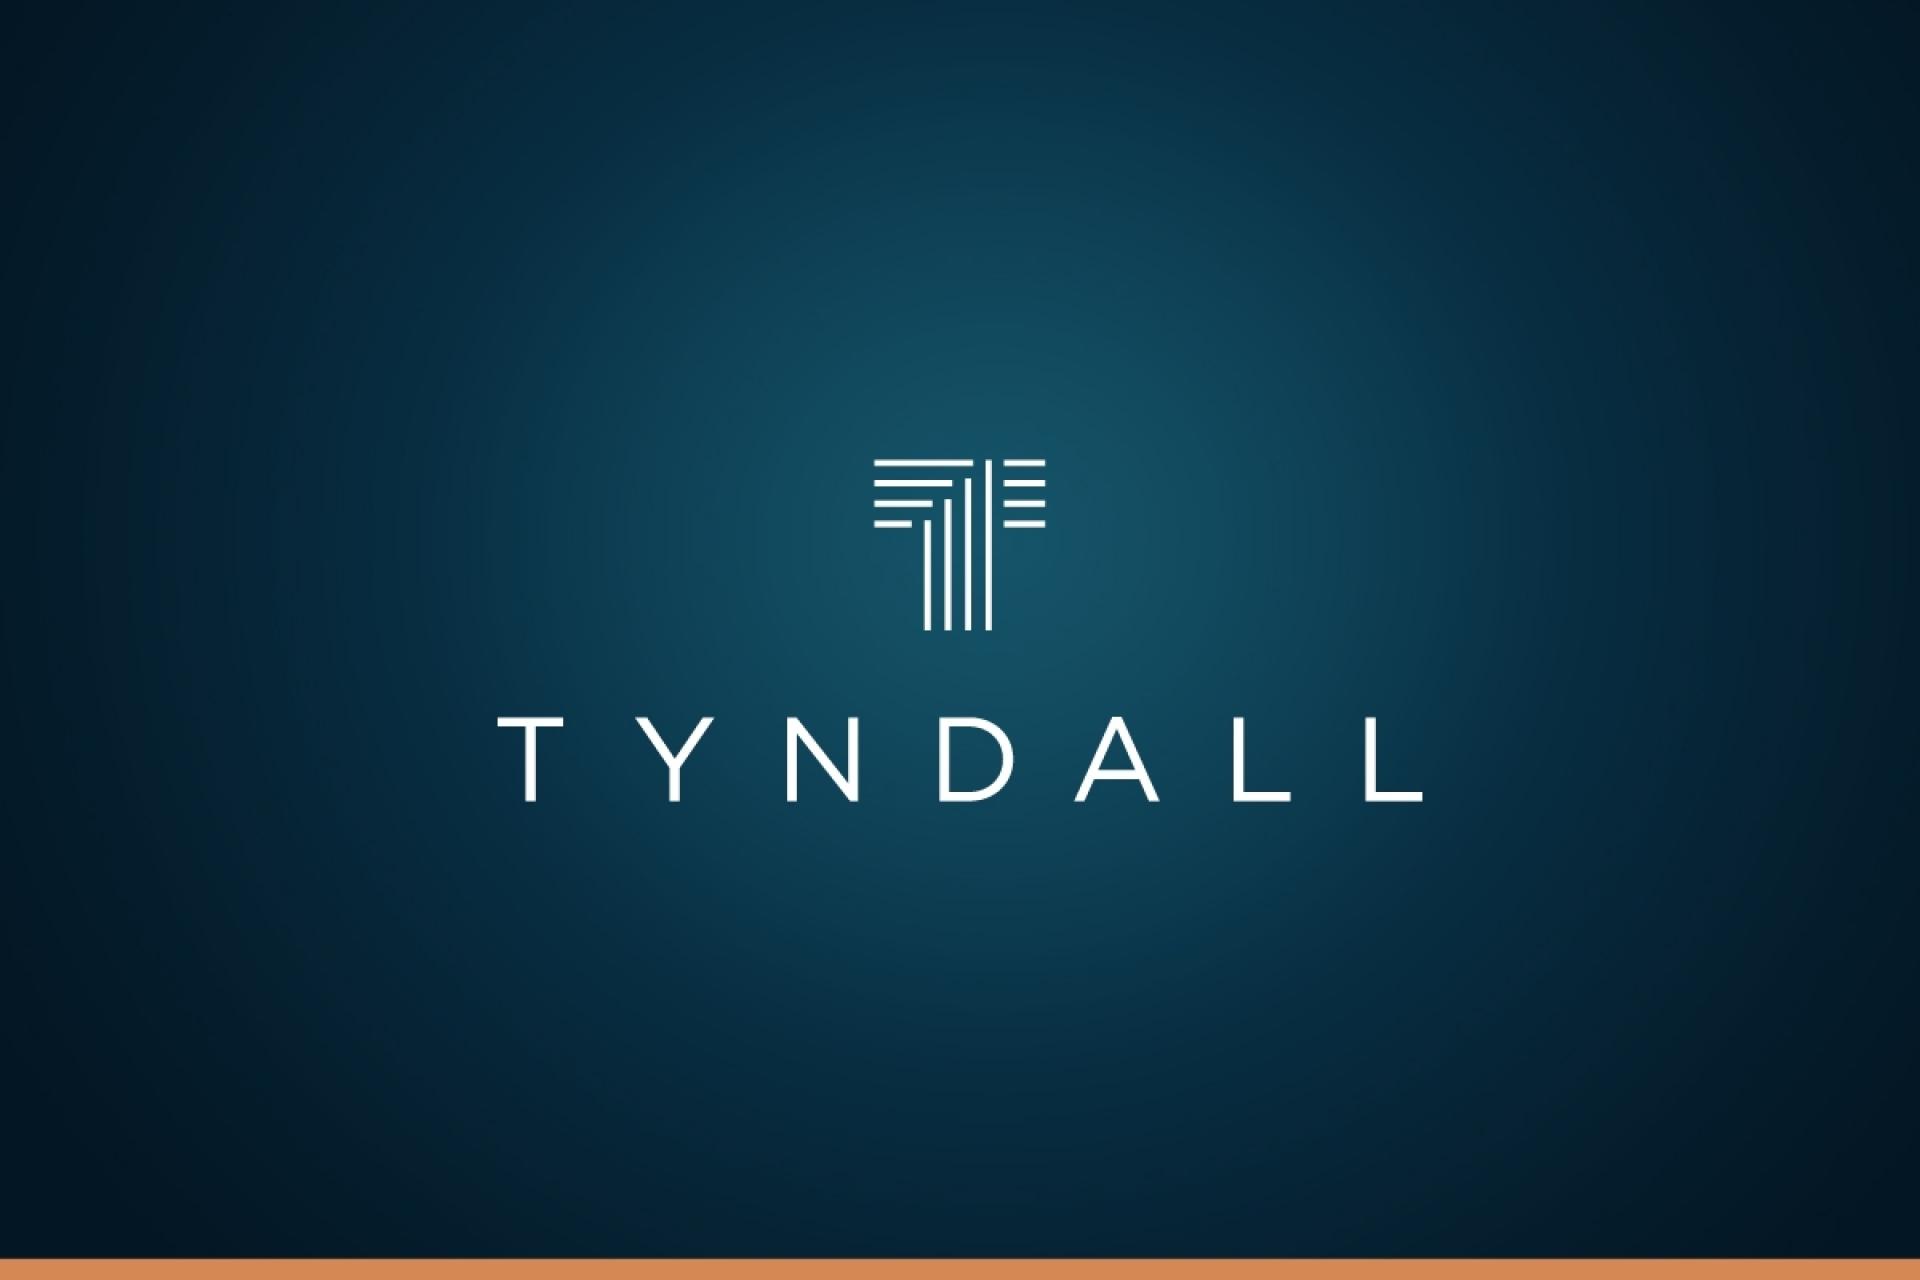 Tyndall 1 01